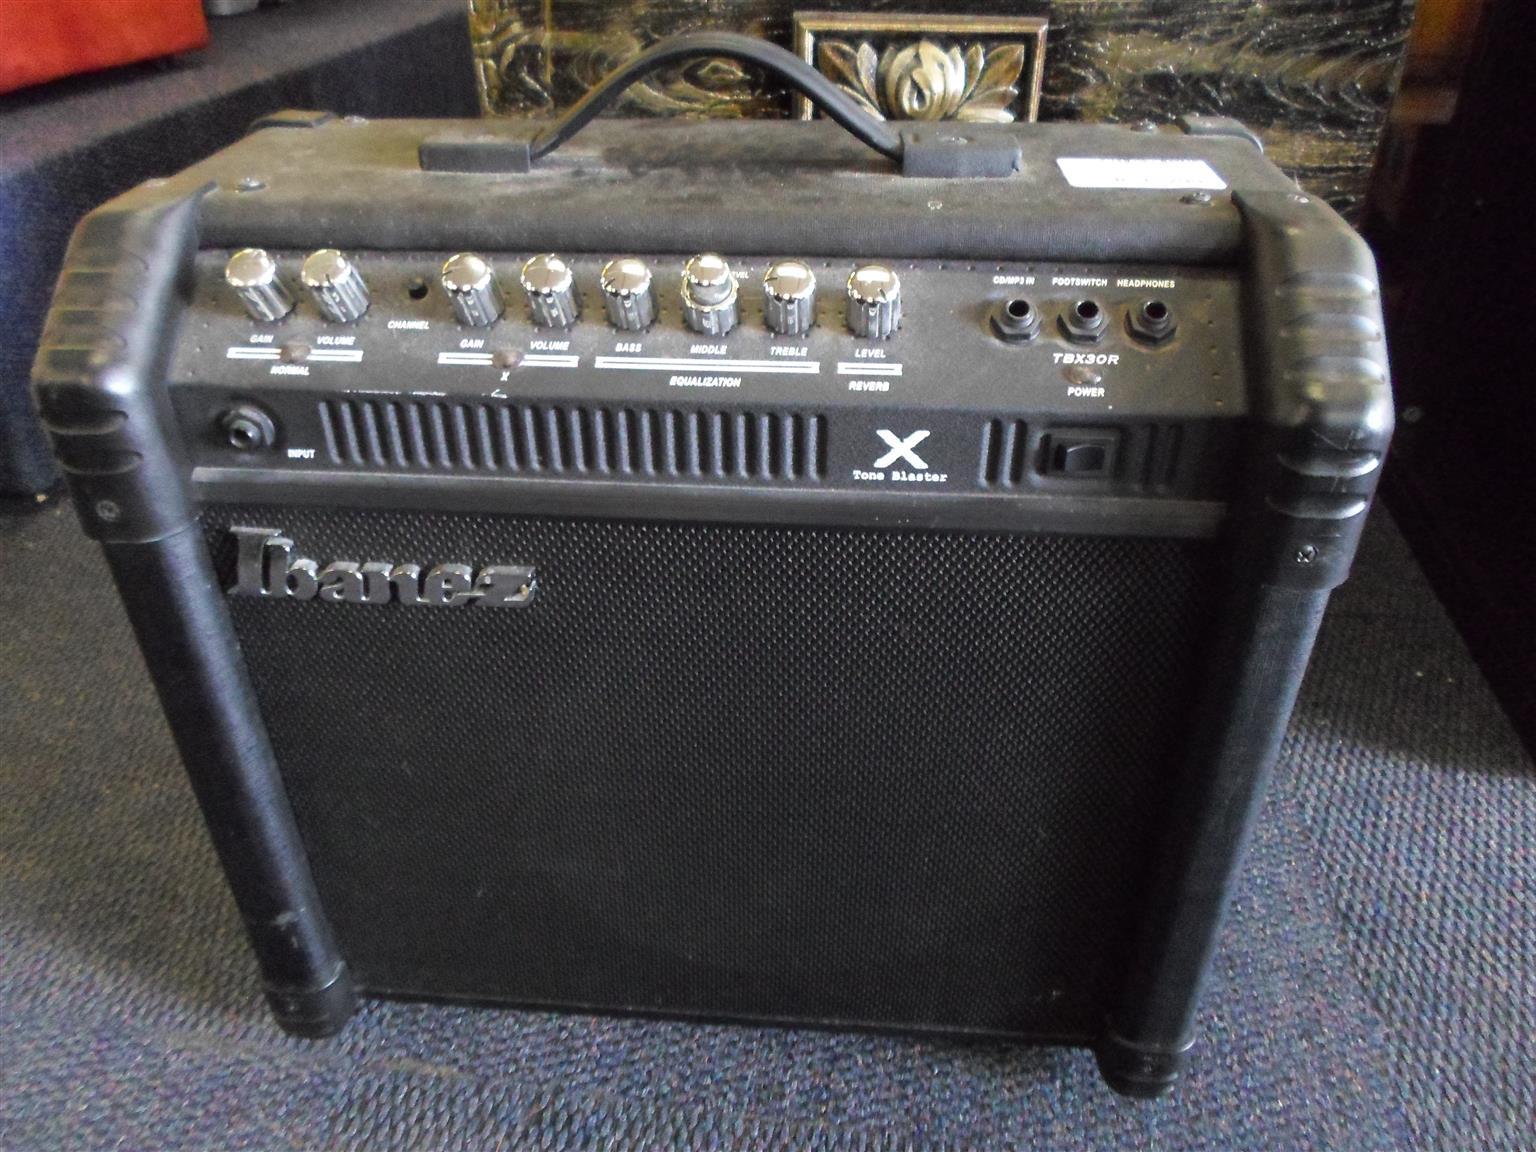 Ibanez TBX30R Guitar Amplifier